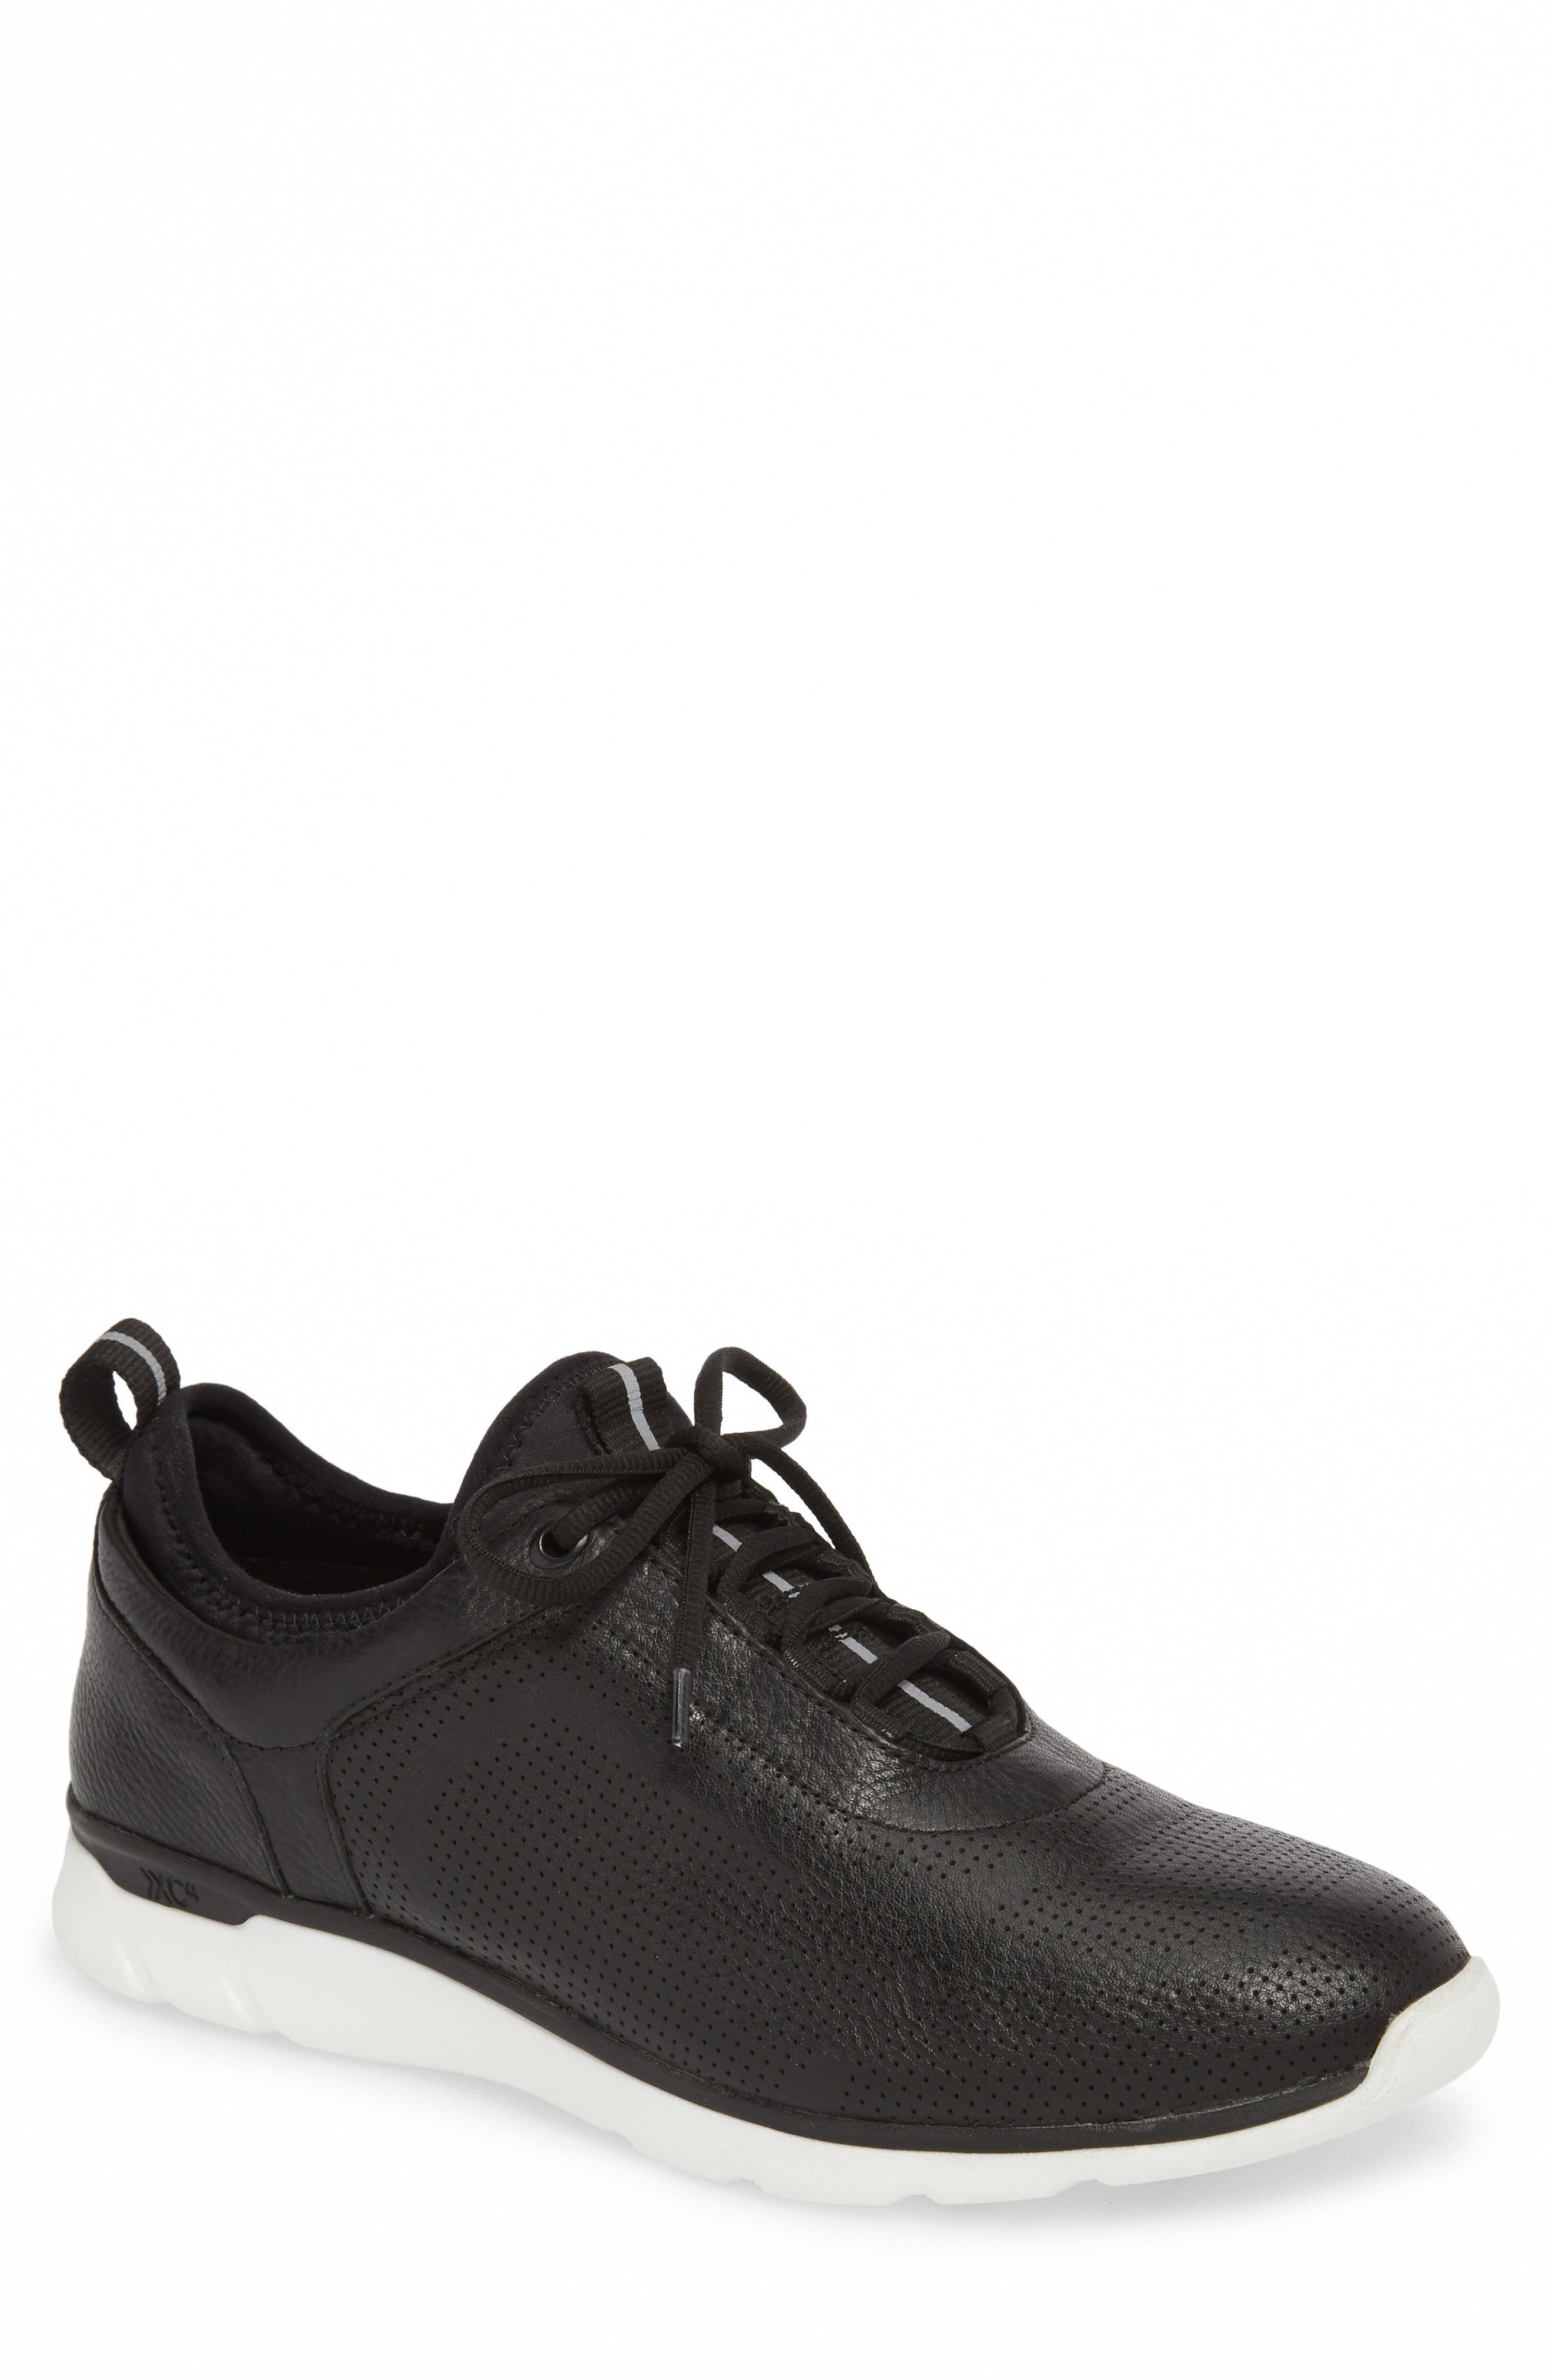 Prentiss XC4<sup>®</sup> Waterproof Sneaker,                             Main thumbnail 1, color,                             Black Leather